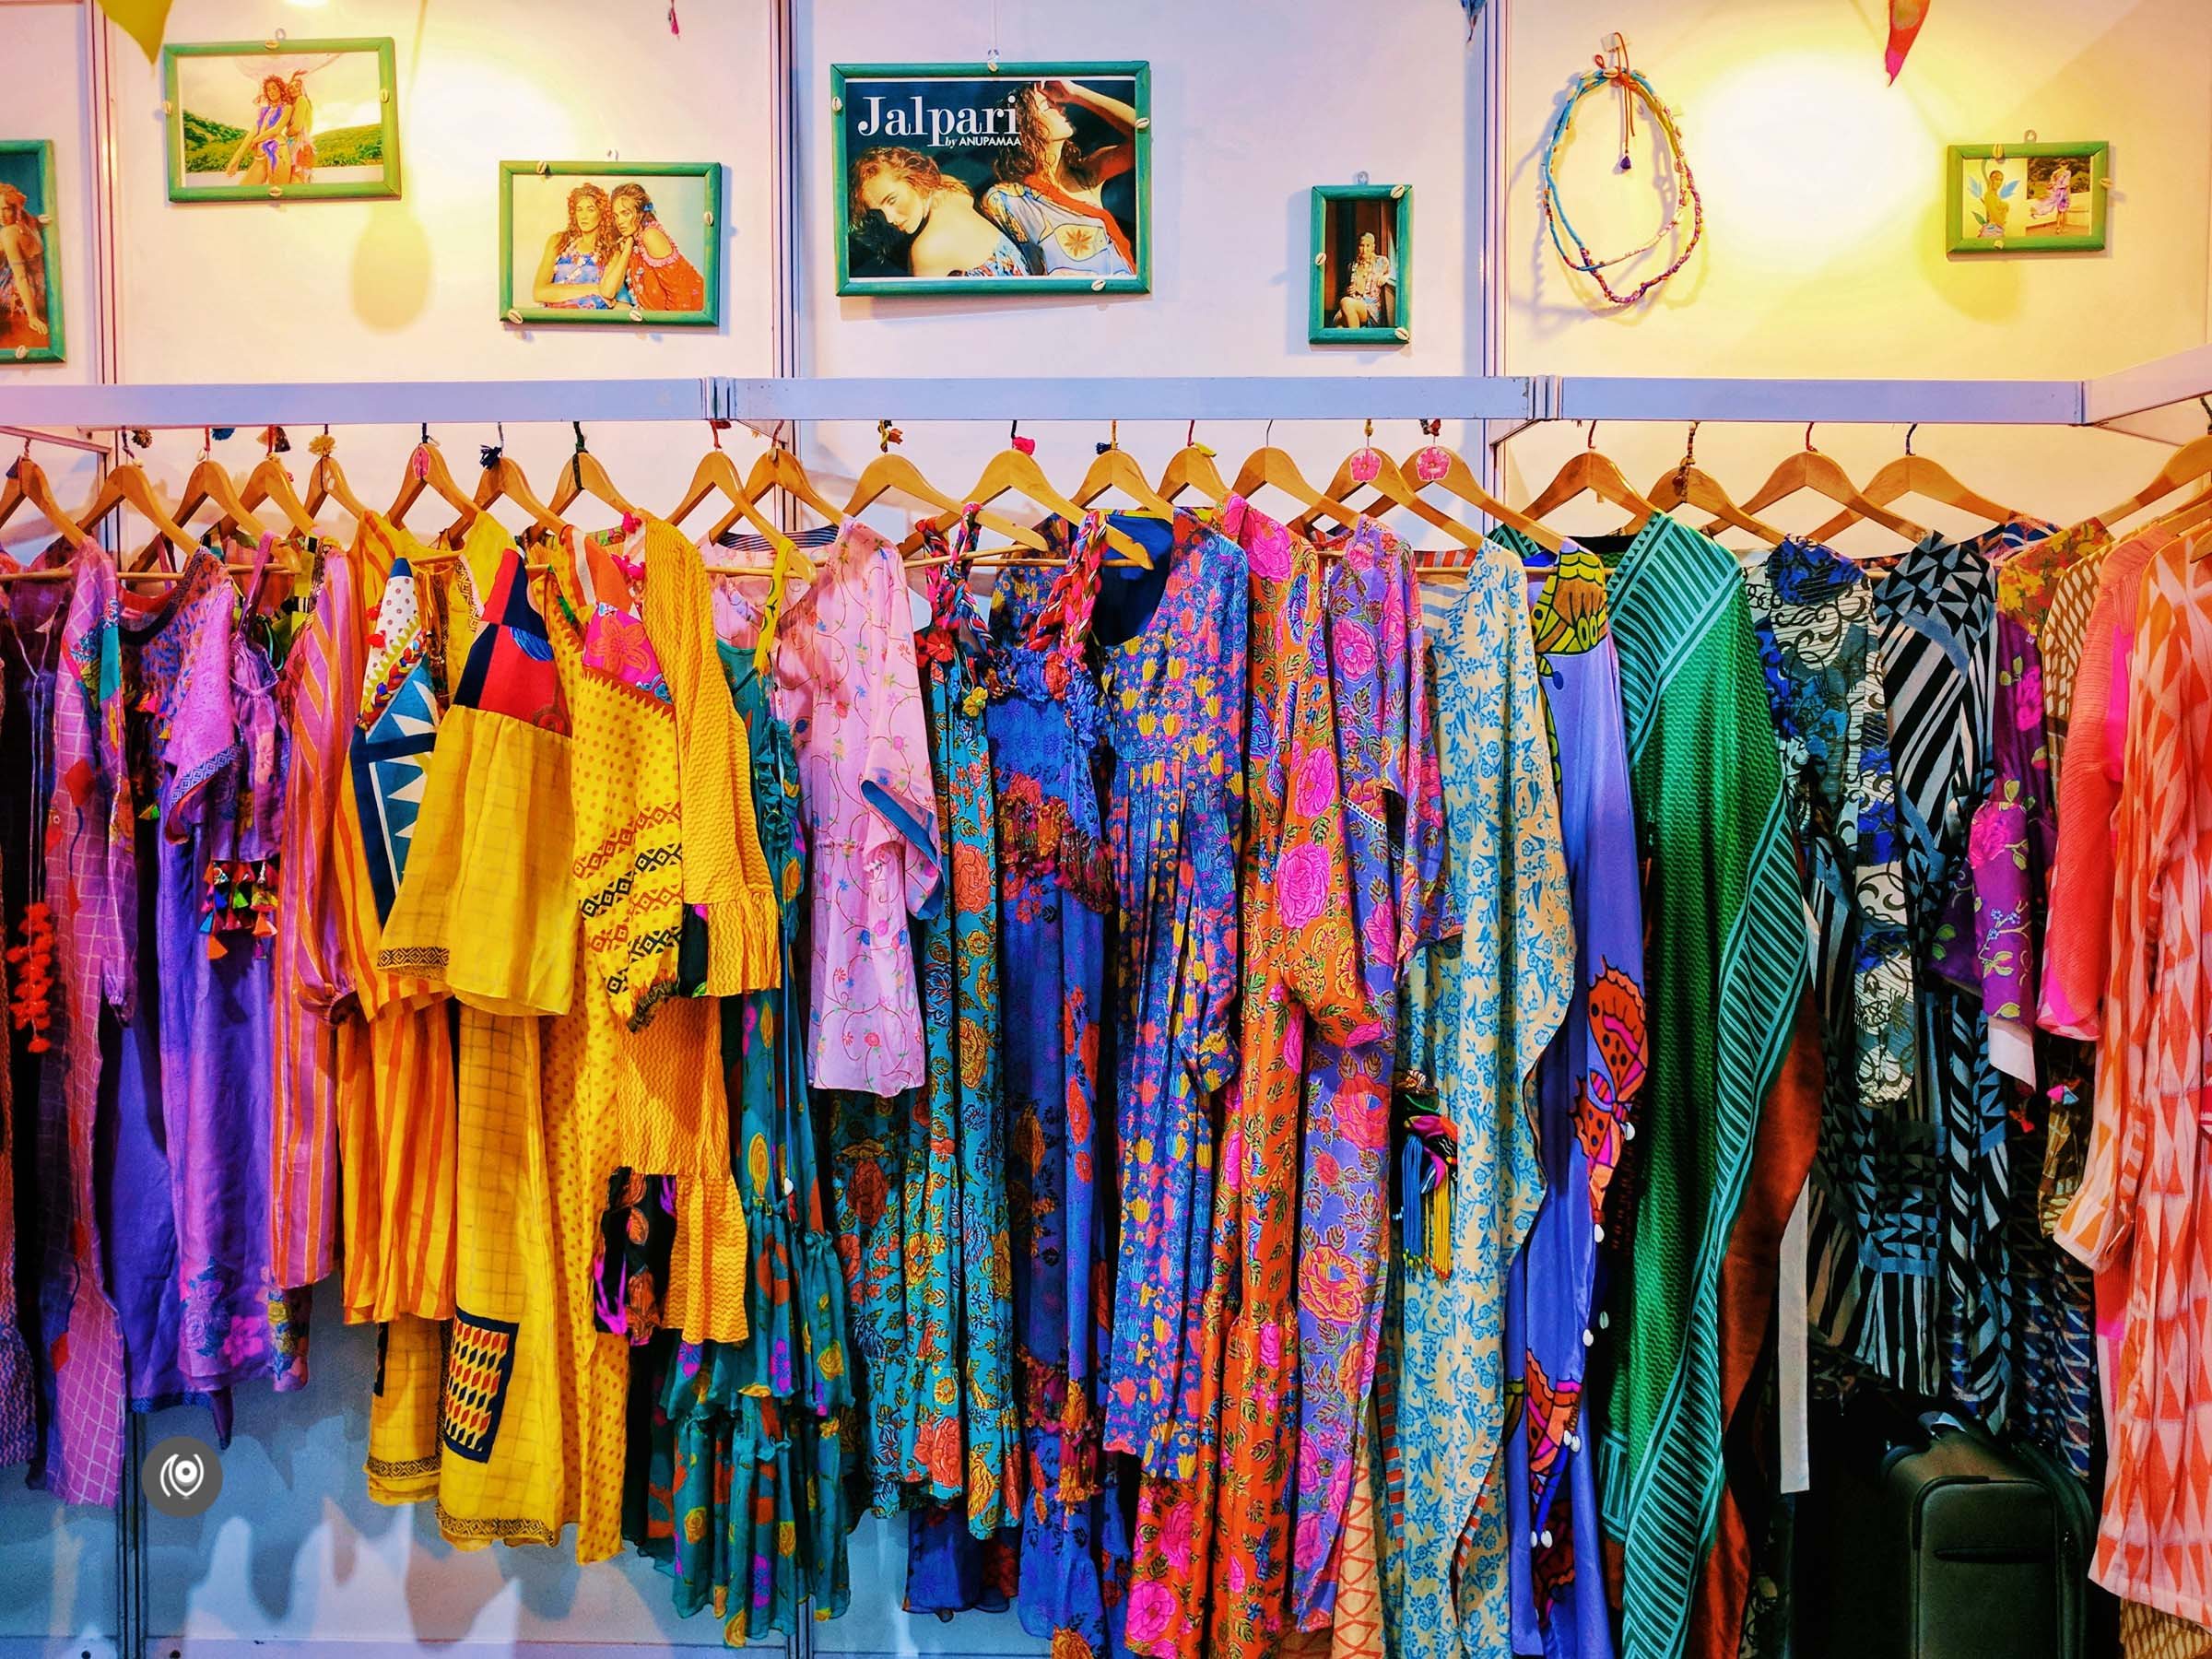 Naina.co, Naina Redhu, EyesForFashion, Amazon India Fashion Week, Spring Summer 2018, AIFWSS18, AIFW, New Delhi, India Fashion Week, NSIC Exhibition Grounds, Wendell Rodricks, Hemant Nandita, Shivan Narresh, Ambar Pariddi Sahai, Anupamaa, Fashion Designers, Street Style